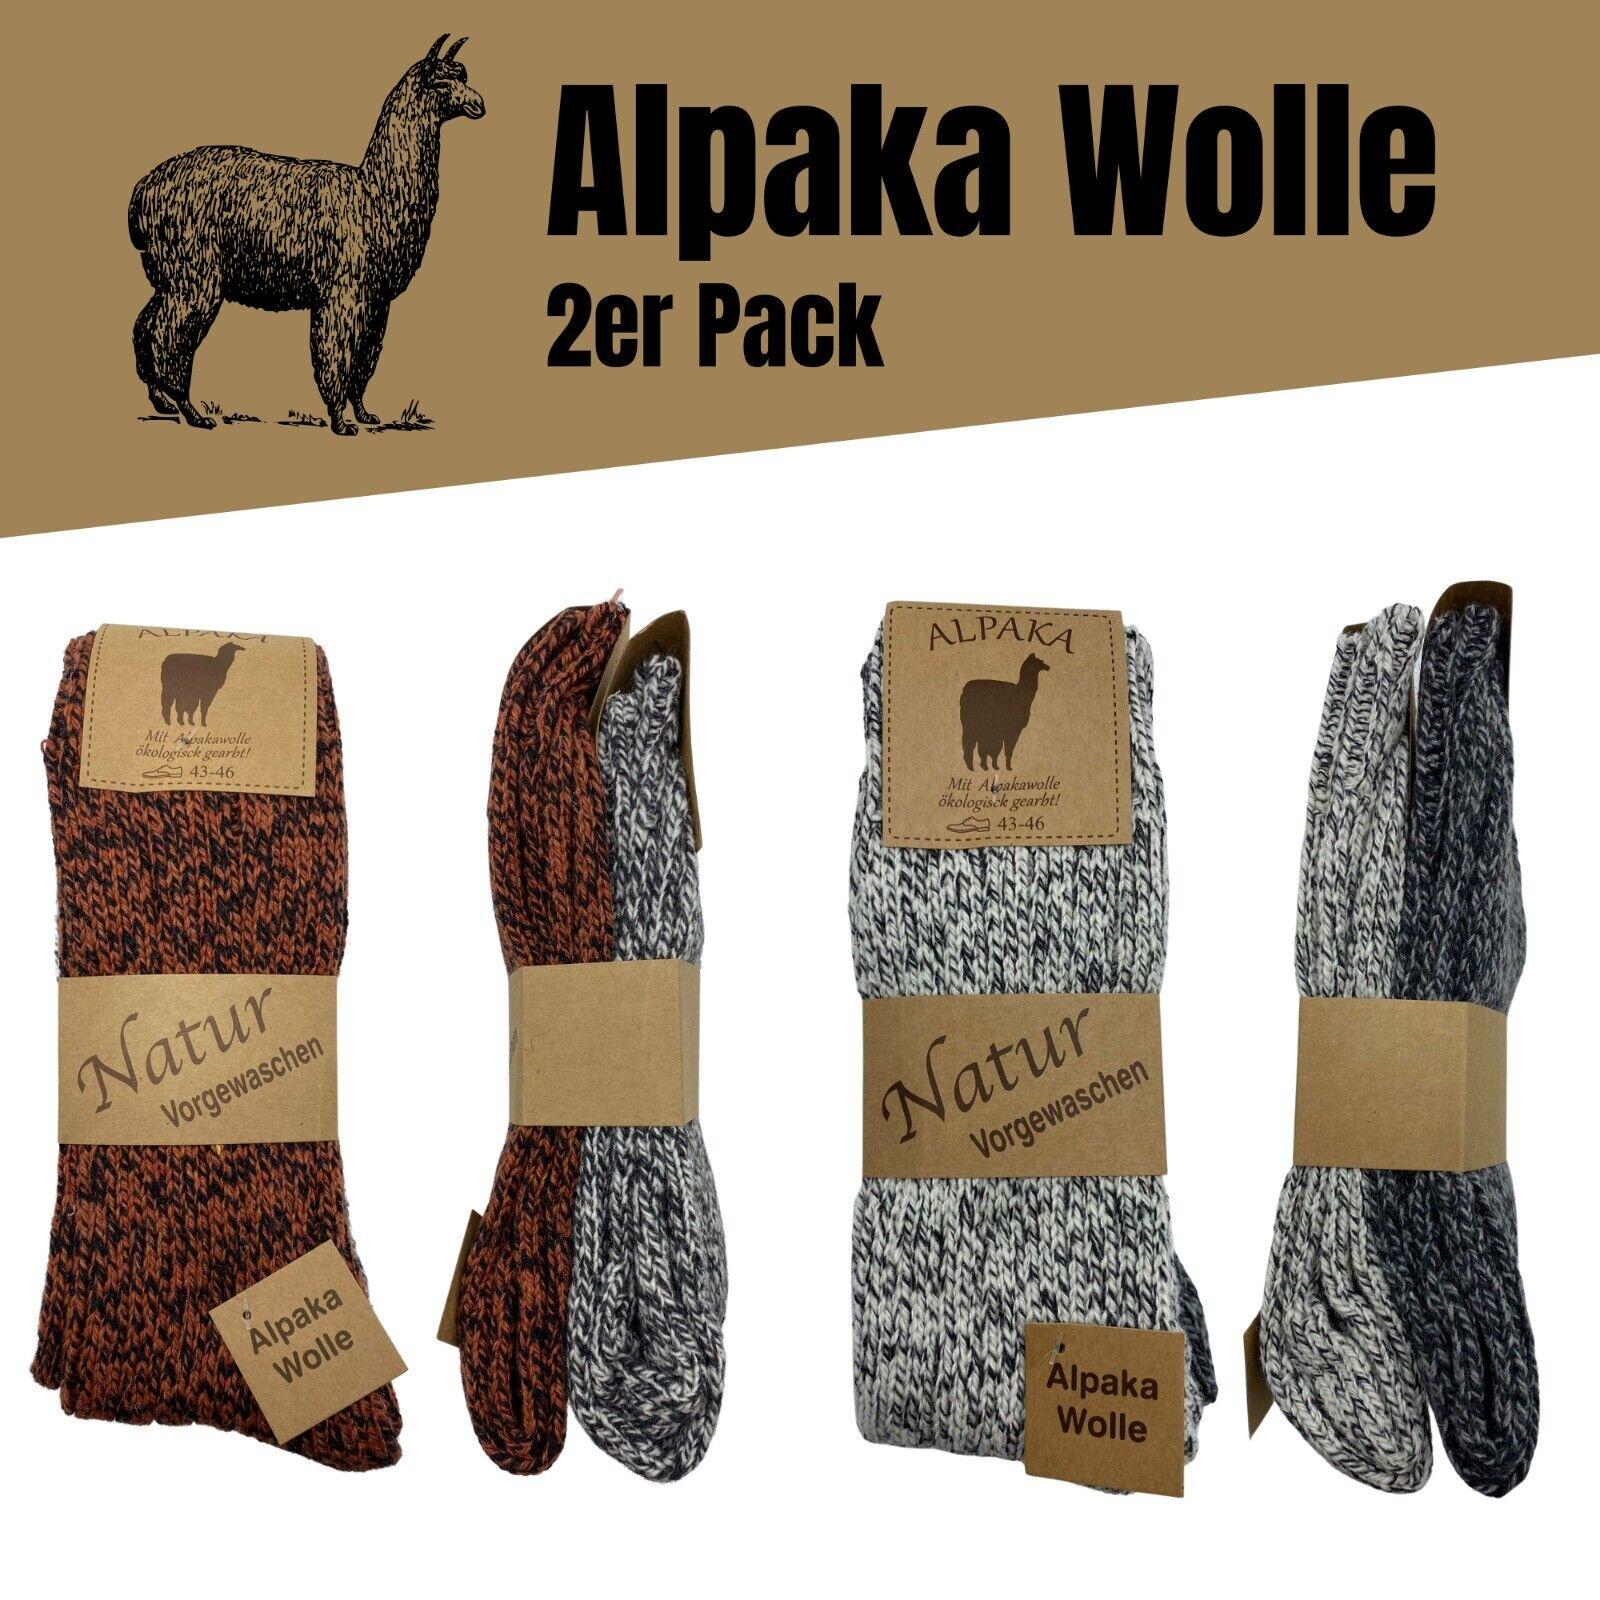 2/4 Alpaka Socken Herren Damen Wollsocken Schafswolle dick gestrickt Strümpfe